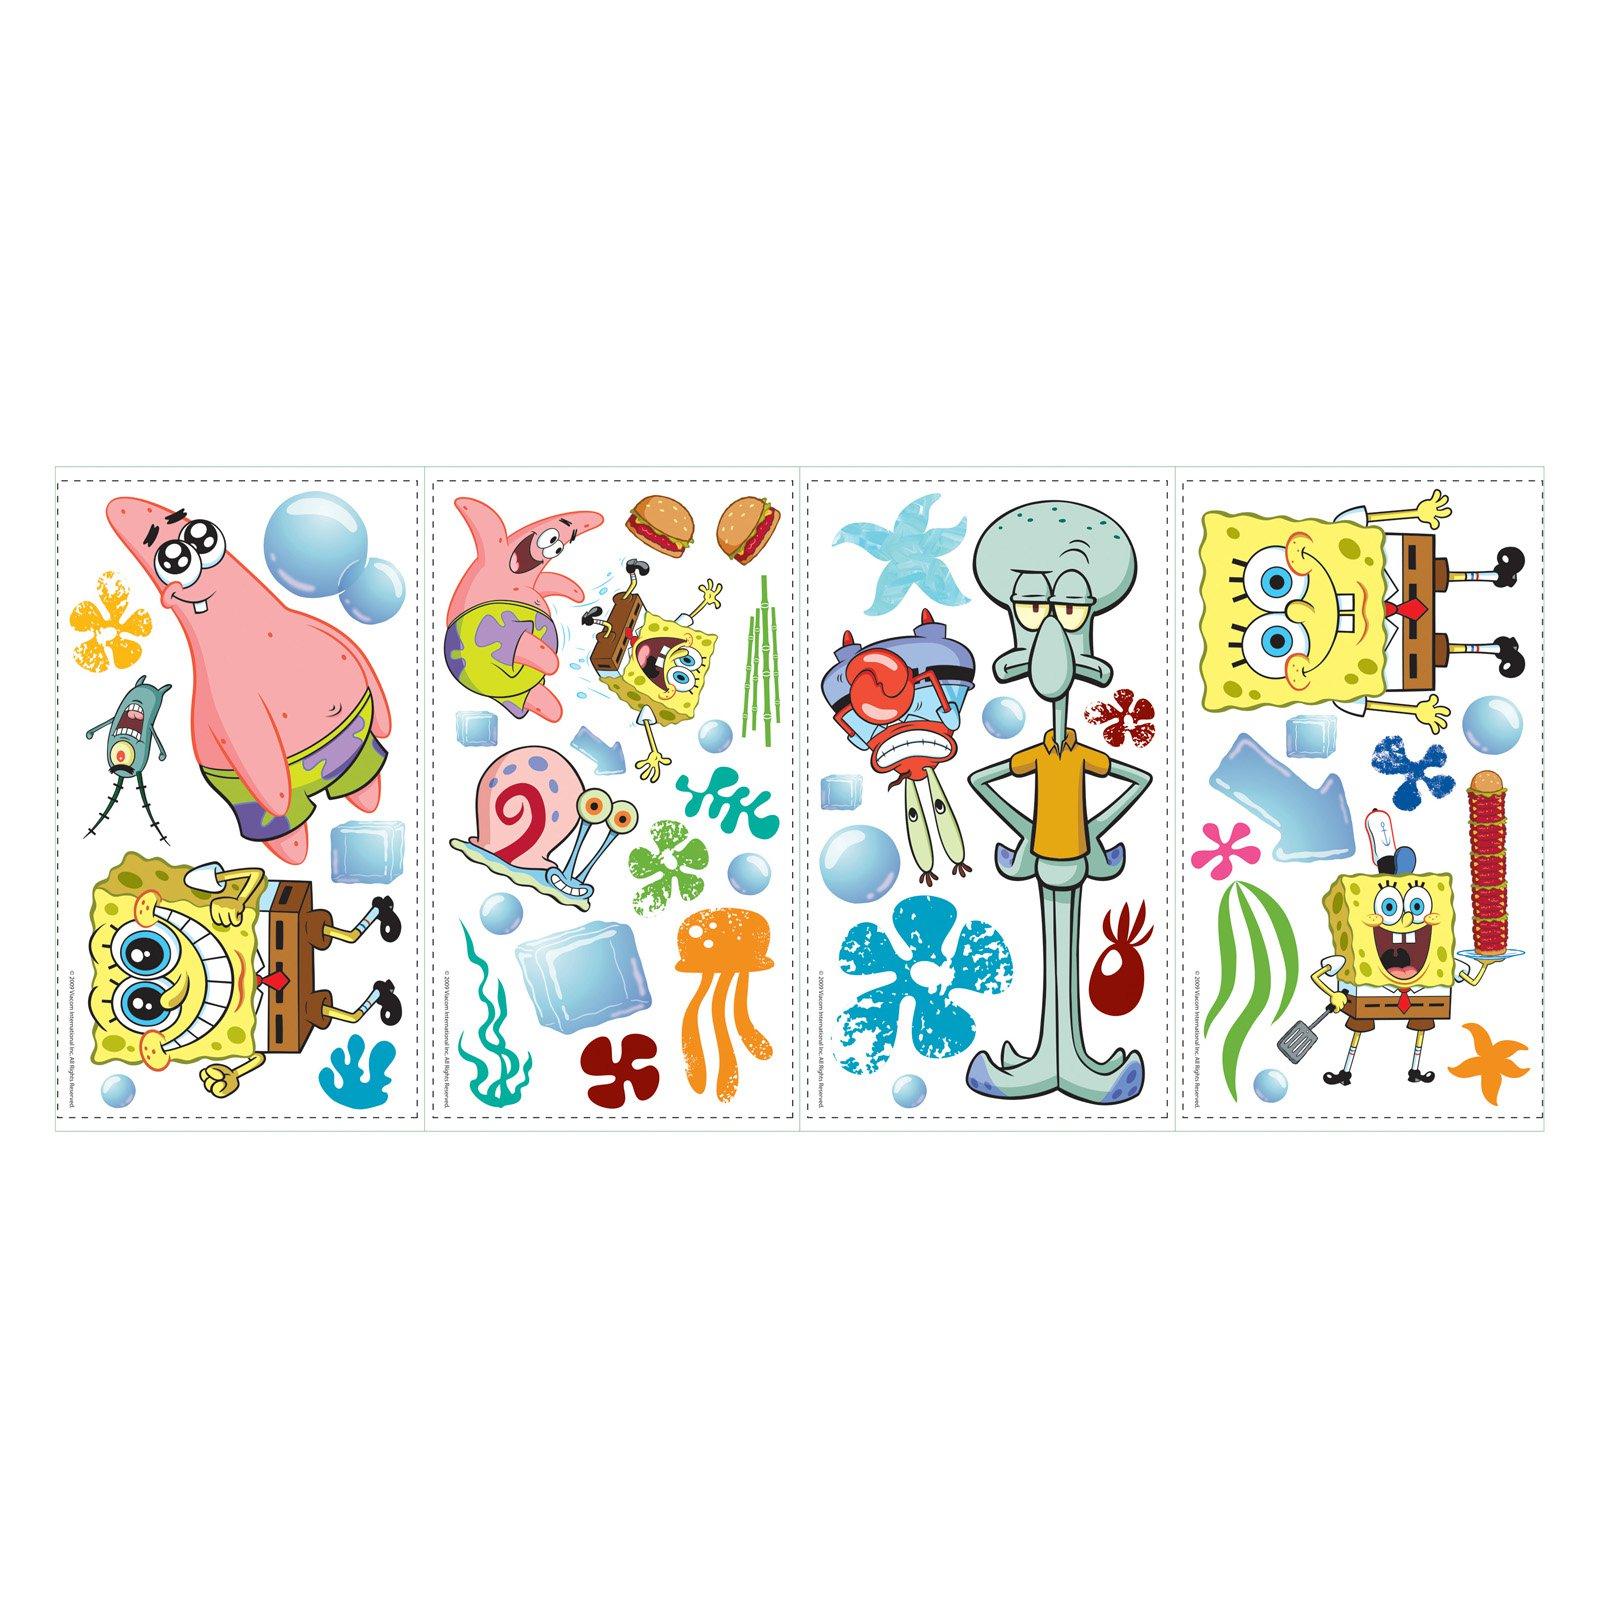 RoomMates SpongeBob SquarePants Peel and Stick Wall Decals